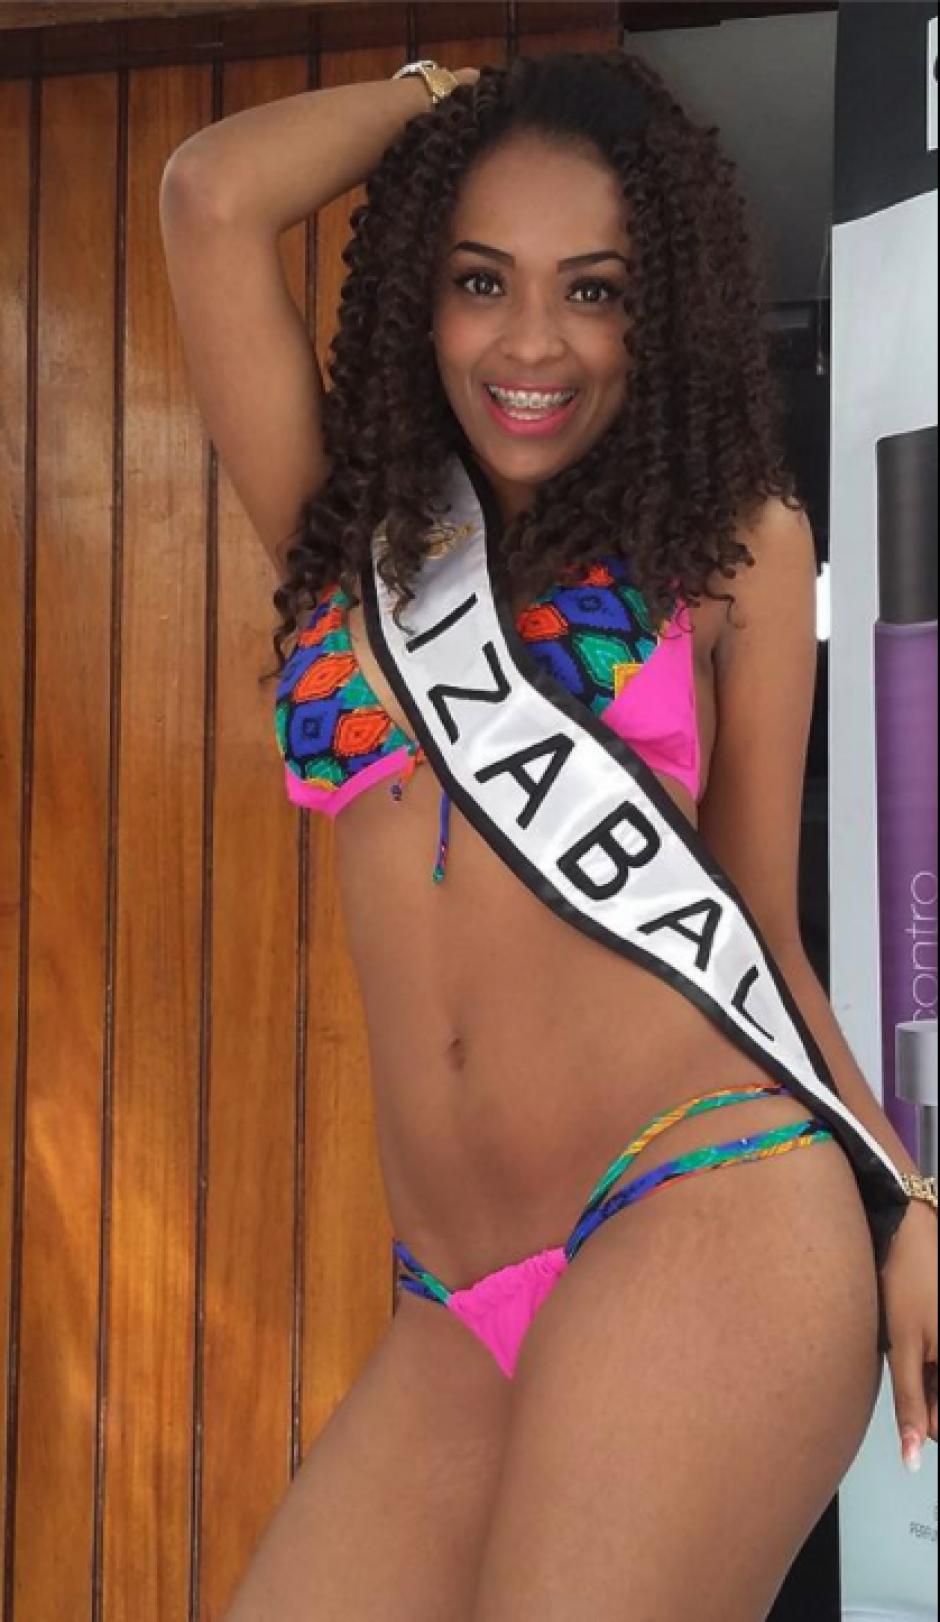 Ella representa a Izabal en dicho concurso. (Foto: Instagram/@nattleer)